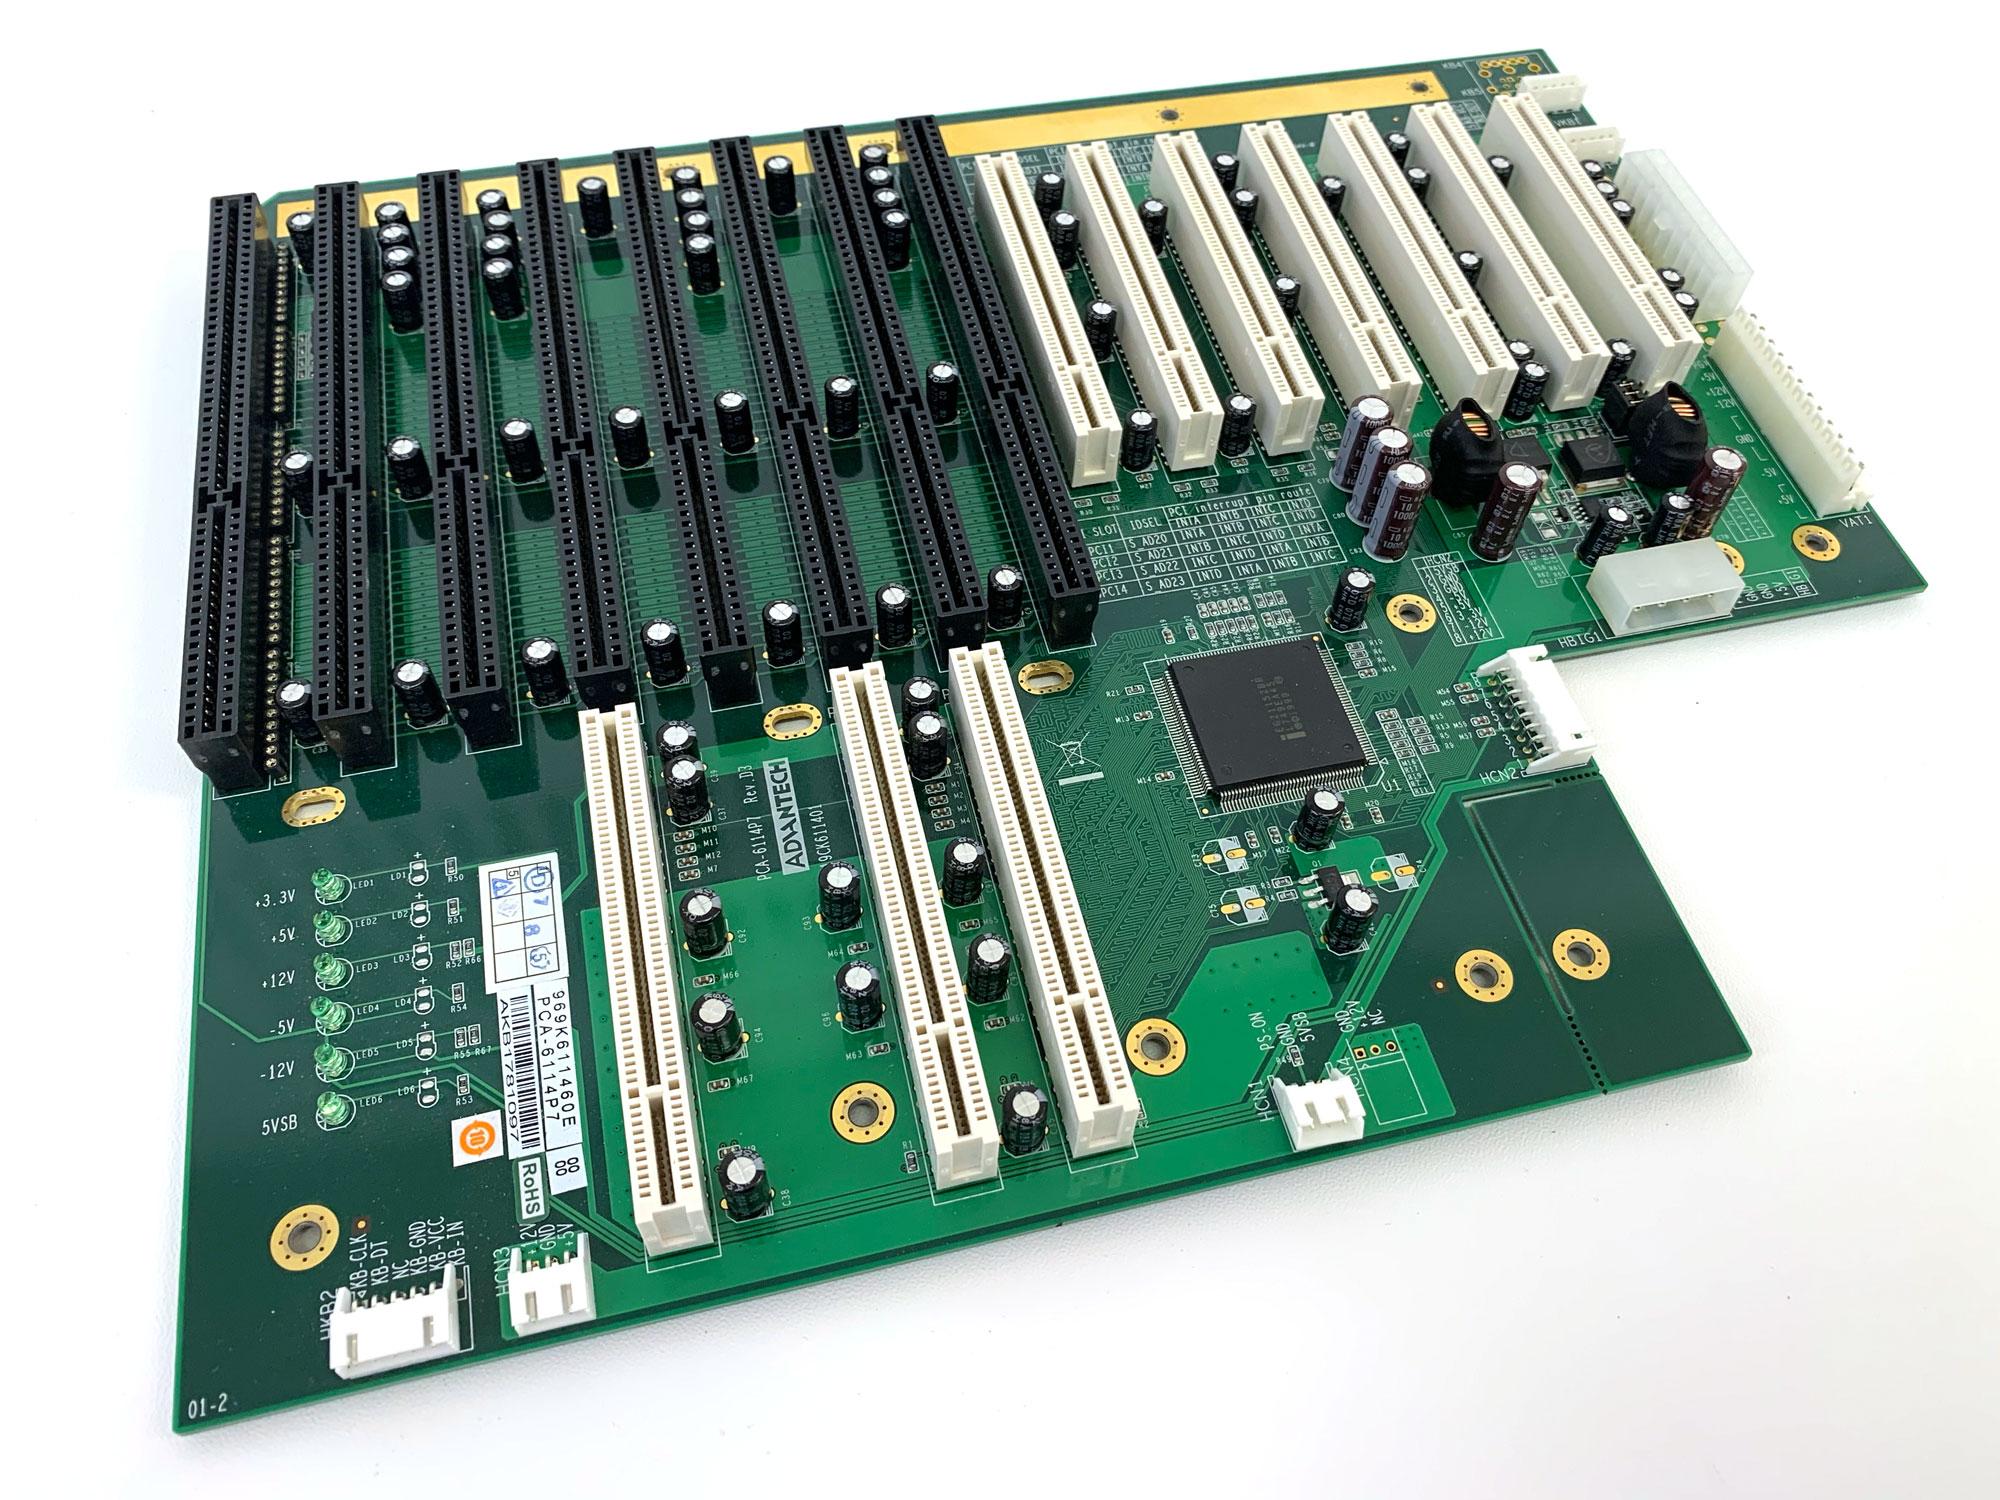 PCA-6114P7 - 14-slot PCI/ISA Backplane